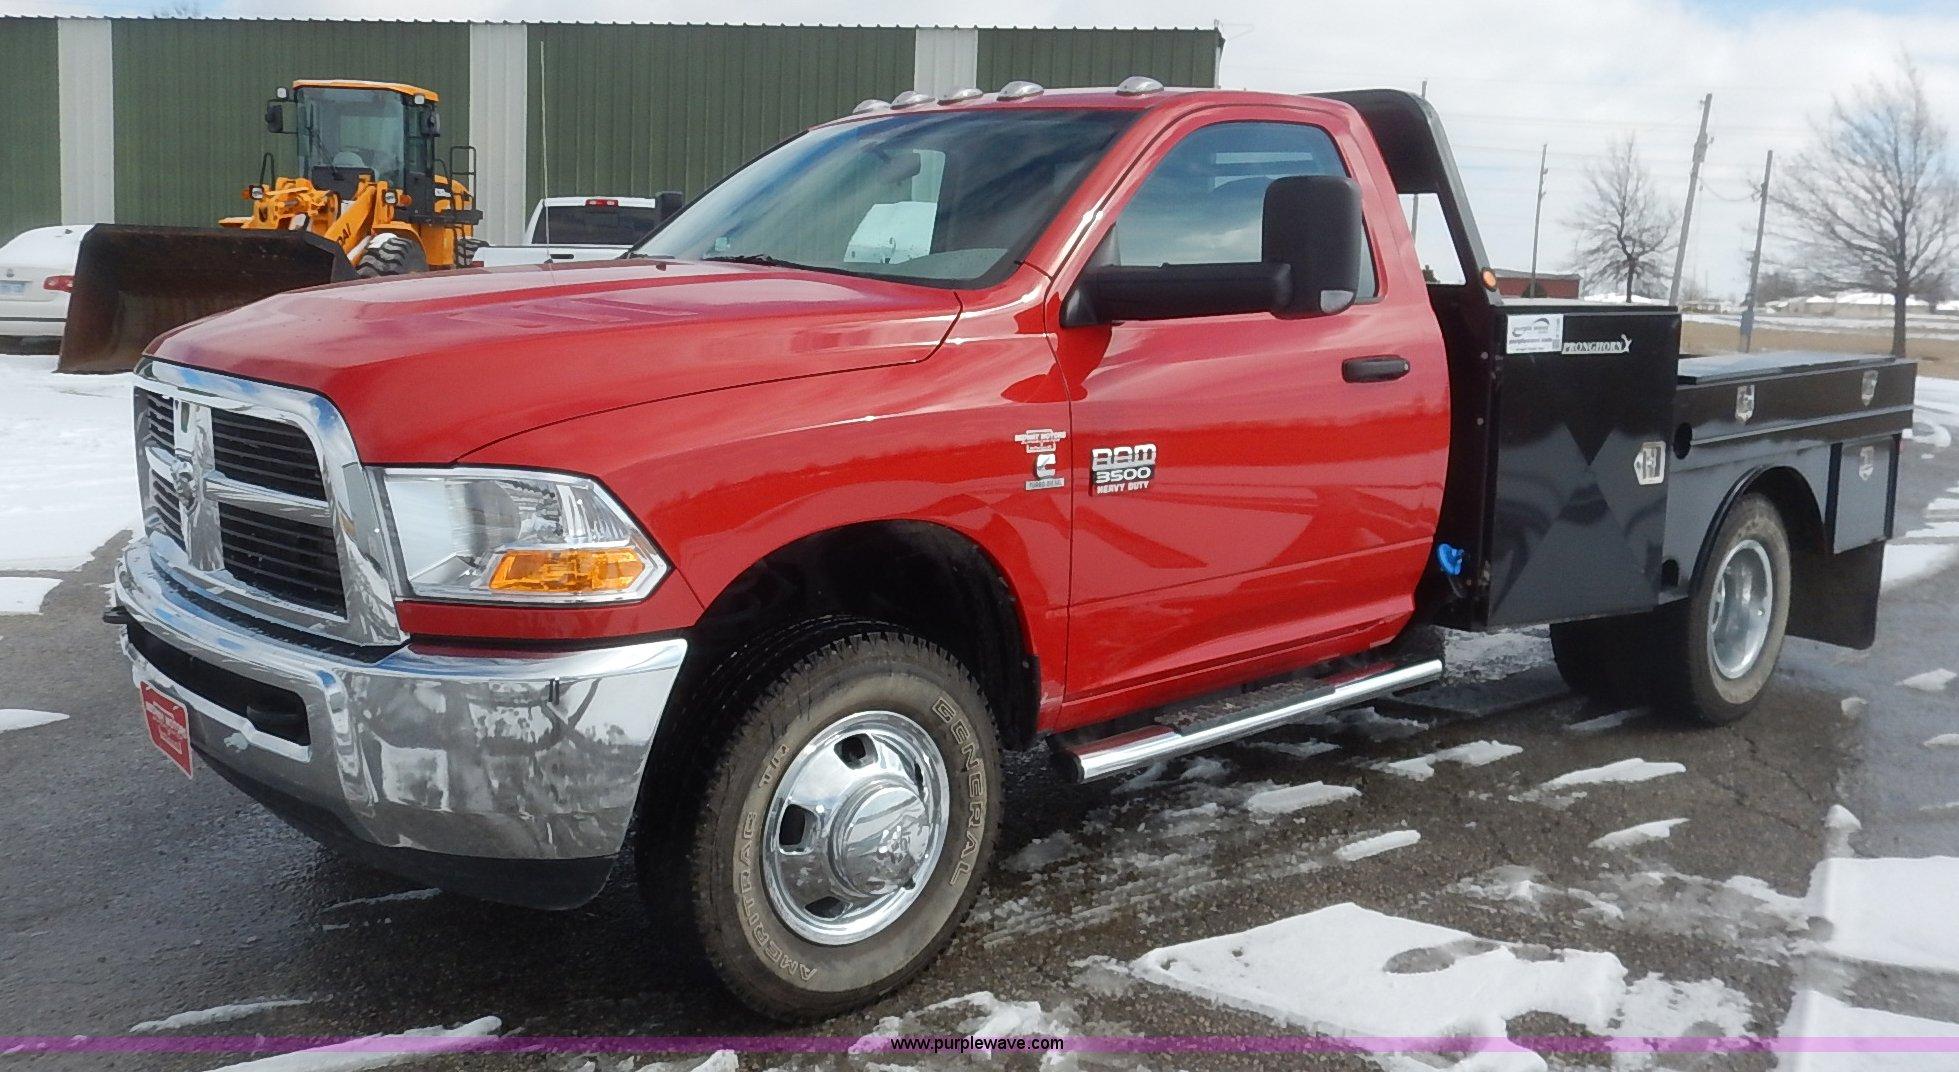 2011 Dodge Ram 3500 Flatbed Truck In Ottawa Ks Item K7140 Sold Purple Wave